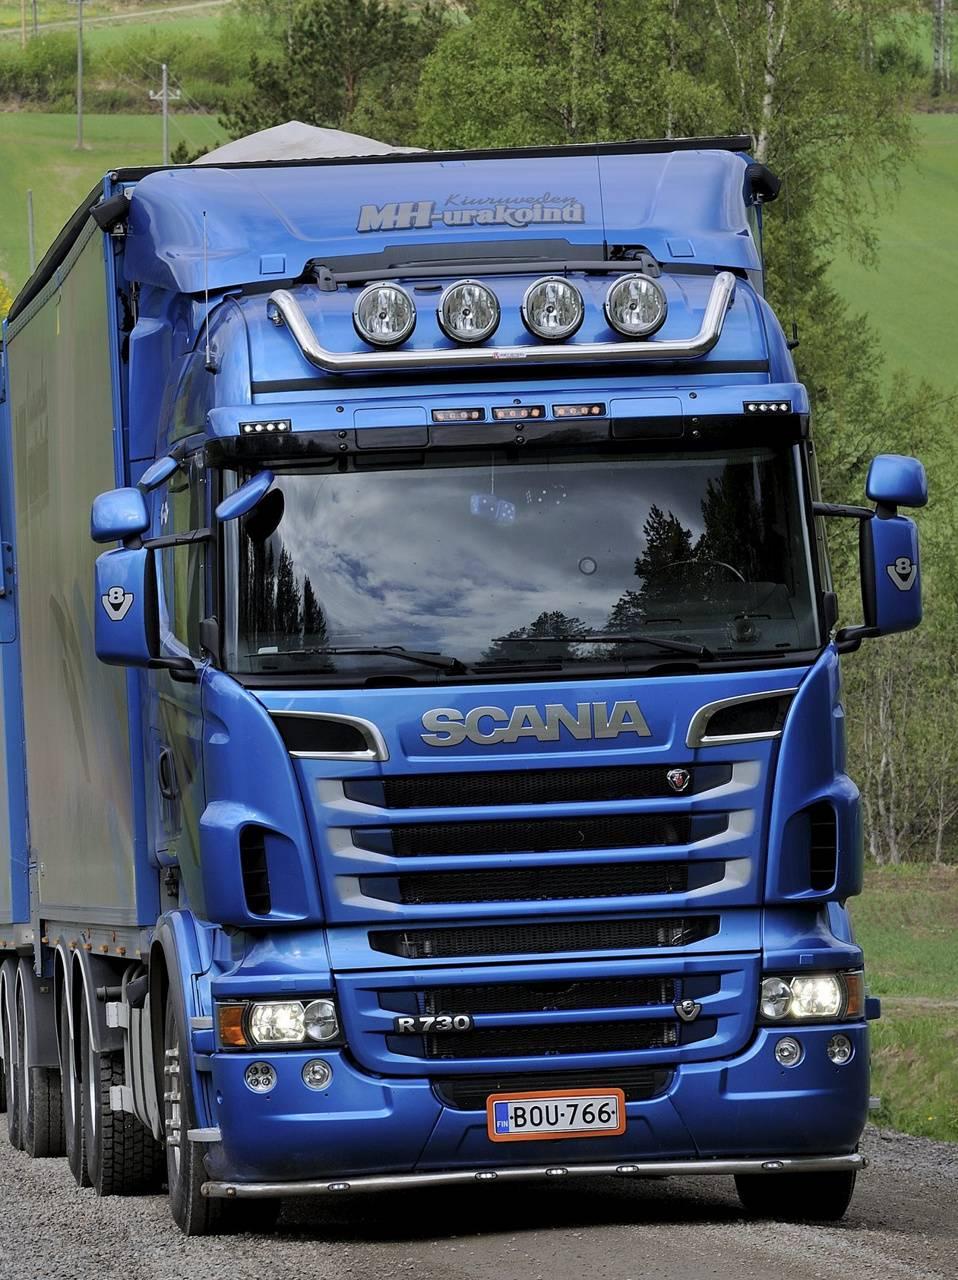 Scania Truck Wallpaper By Robikacika14 E1 Free On Zedge